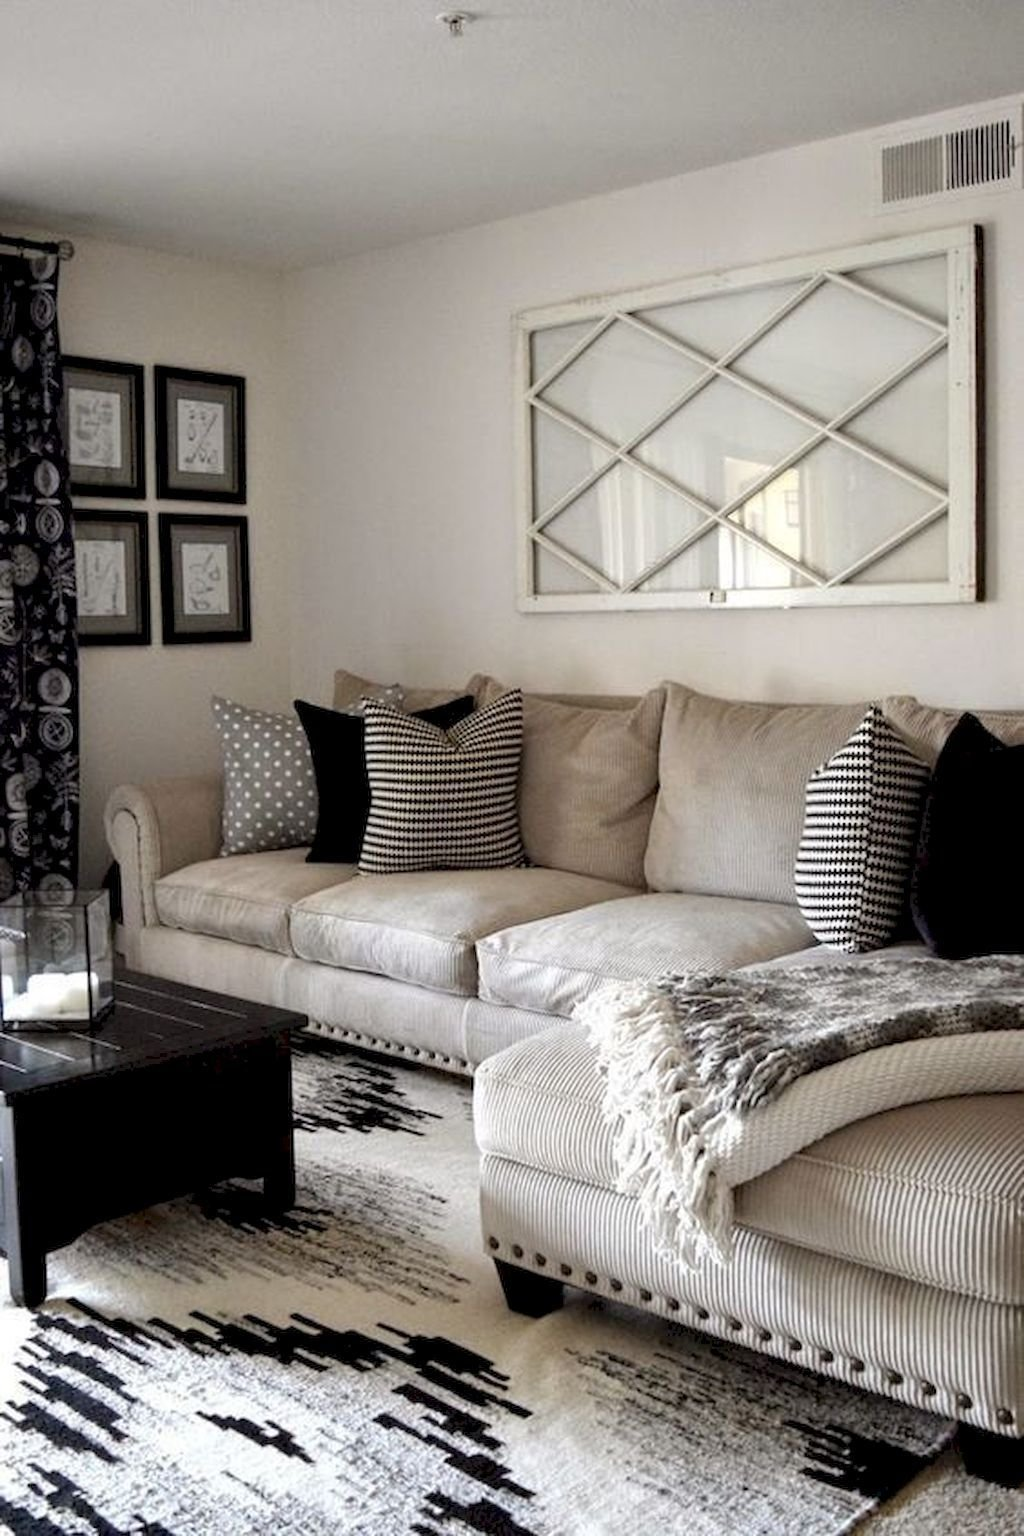 10 Attractive Living Room Decor Ideas On A Budget adorable 36 small living room ideas on a budget https besideroom 6 2021